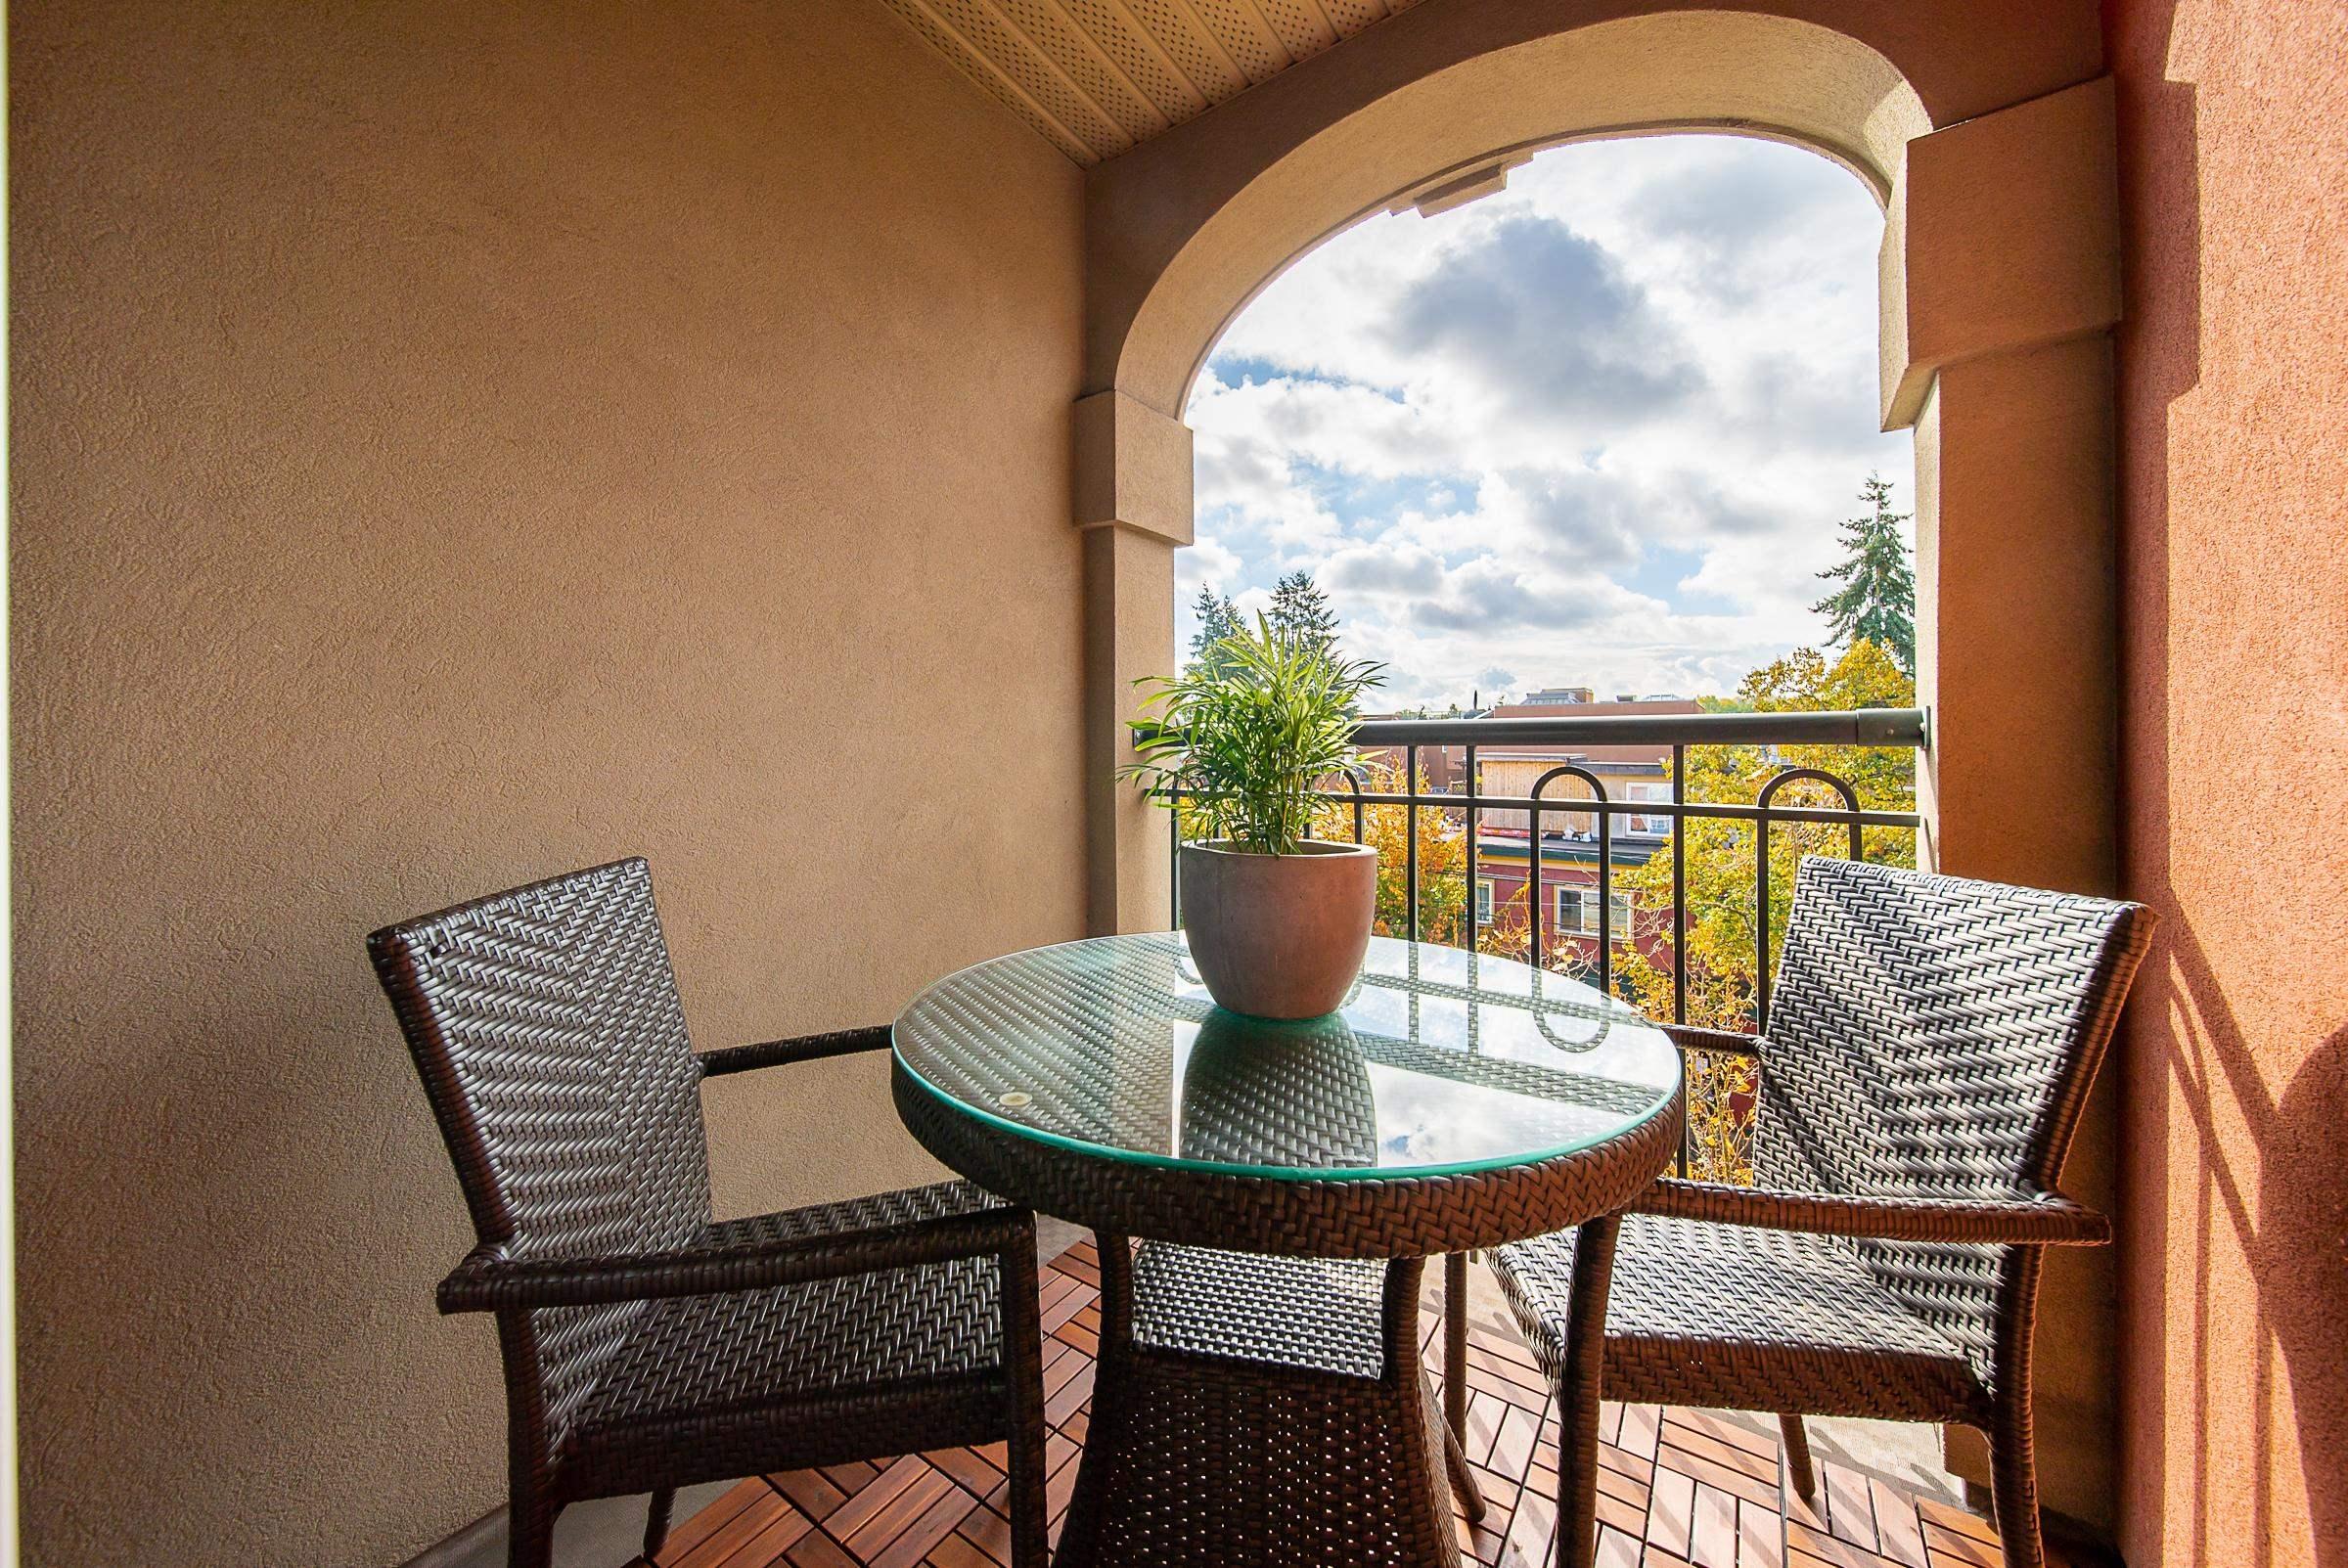 406 1989 DUNBAR STREET - Kitsilano Apartment/Condo for sale, 1 Bedroom (R2624949) - #6